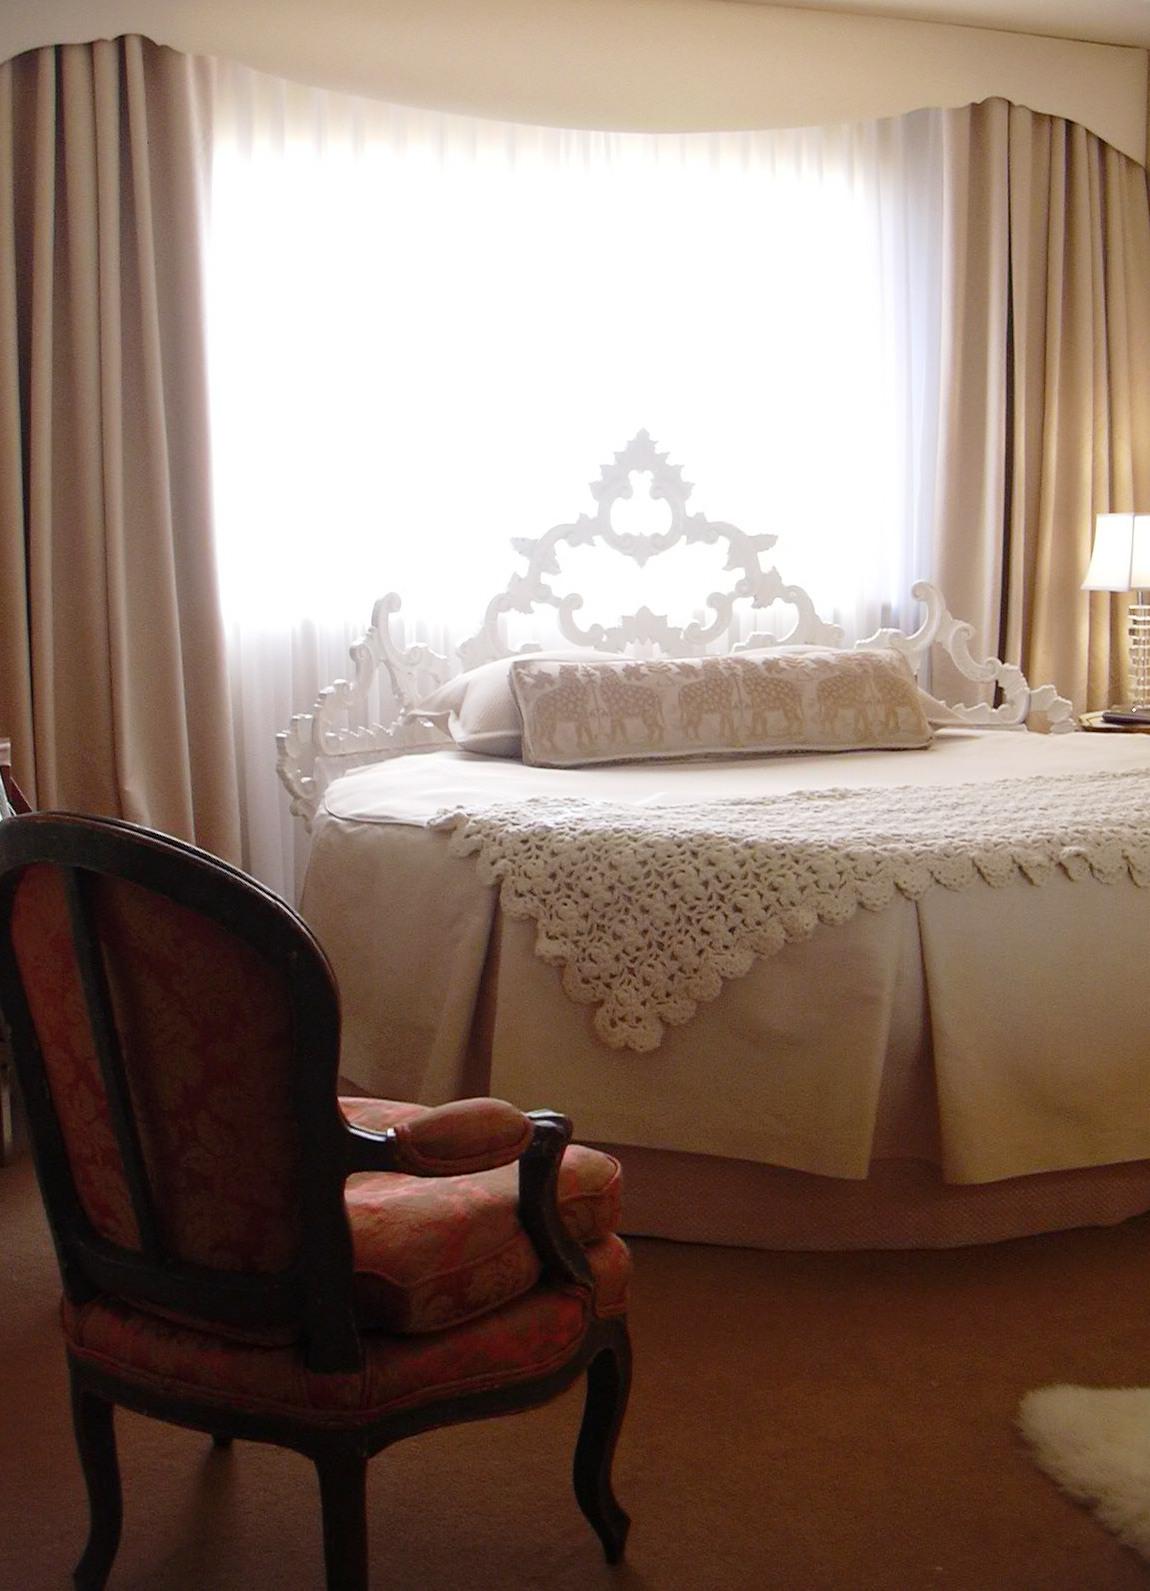 Bed & Chair.jpg